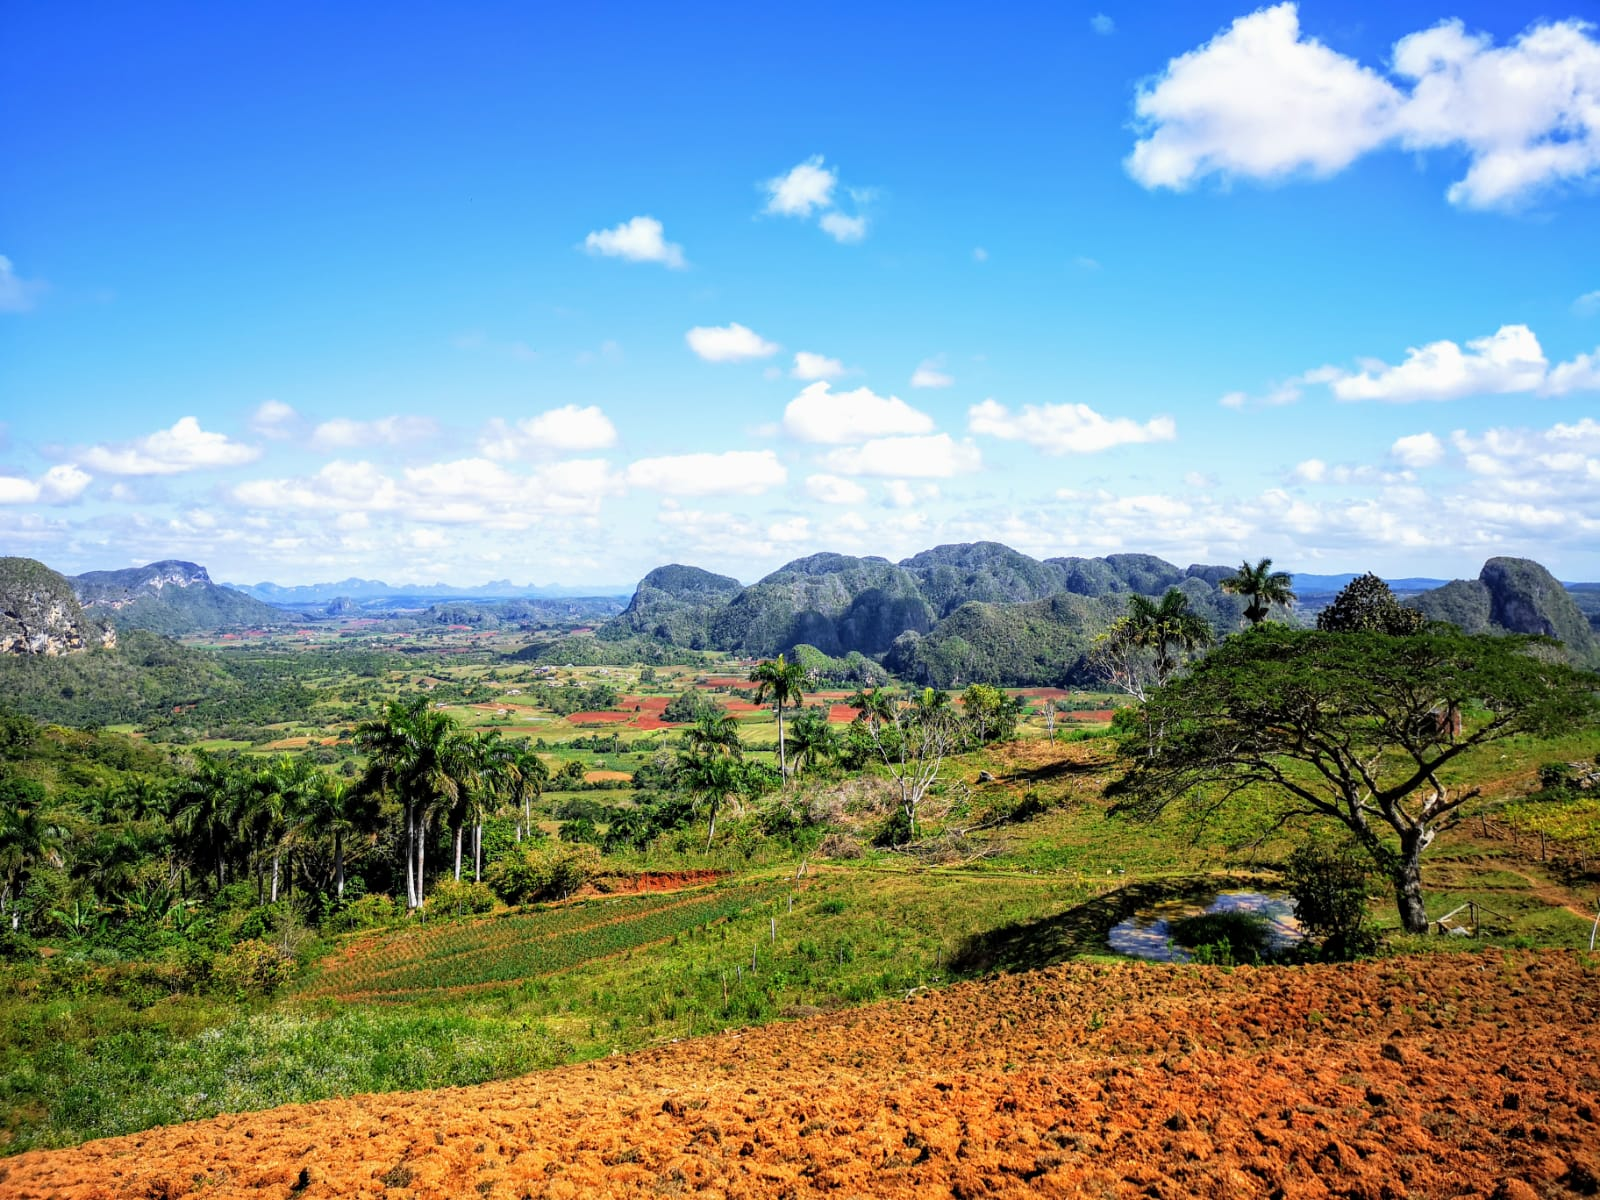 tourameo-reiseplanung-reiseziel-kuba-vinales-landschaft